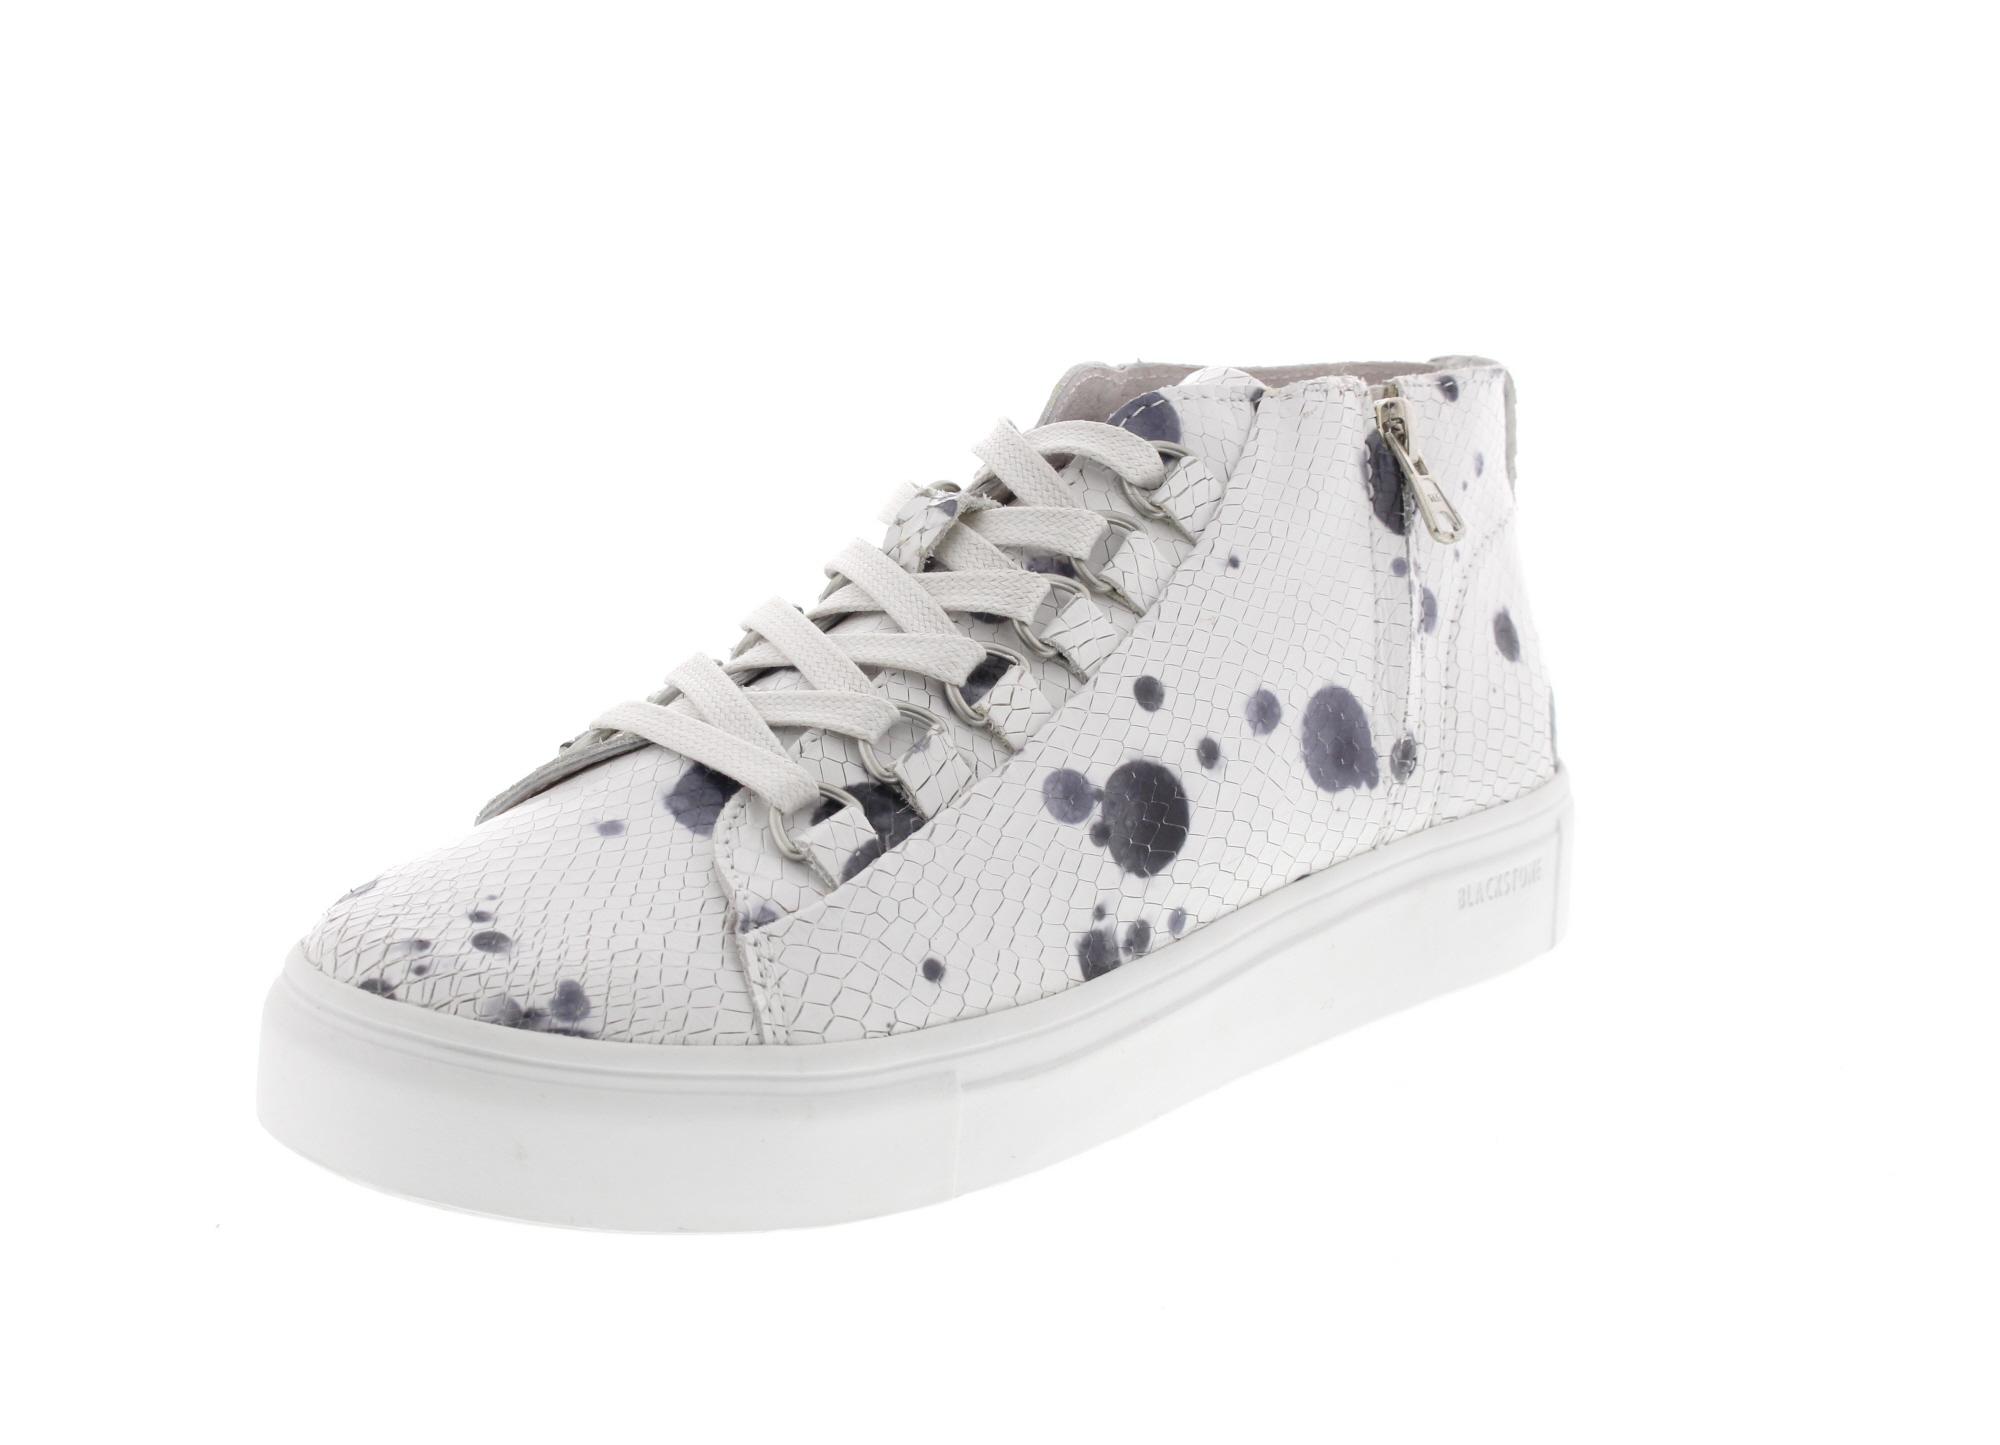 BLACKSTONE Damenschuhe - Sneaker NL43 - circles black0